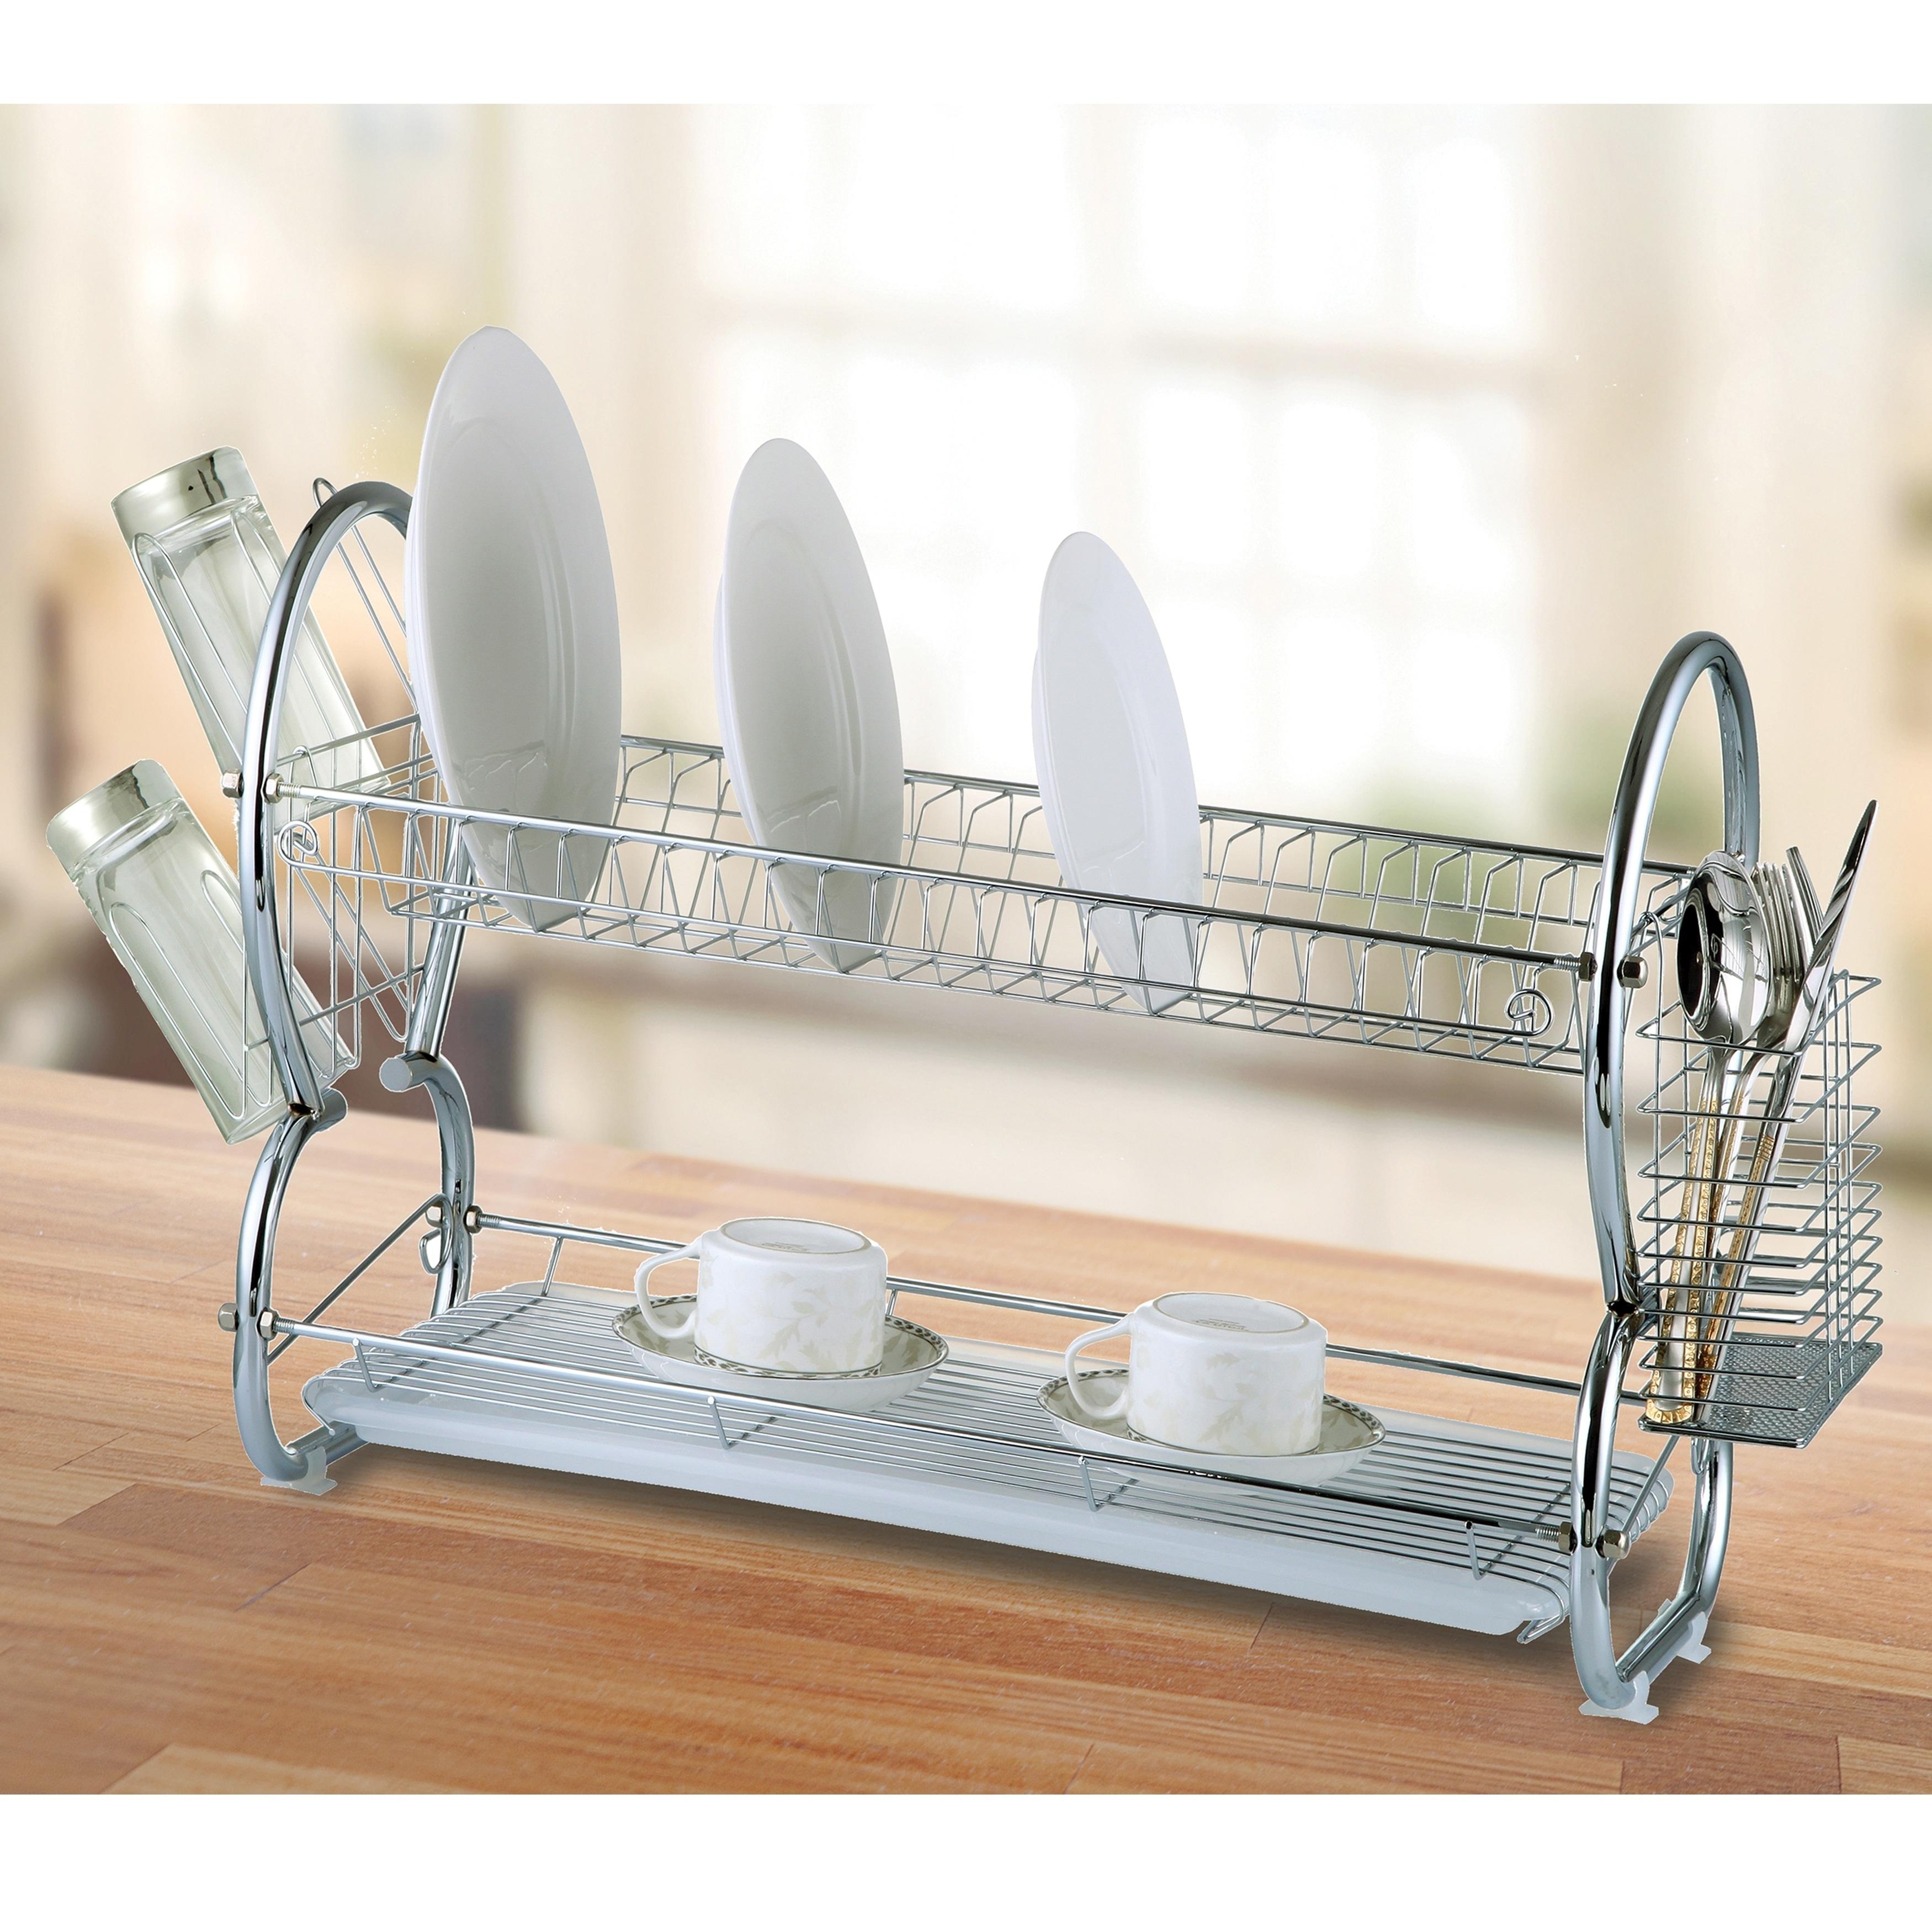 Diamond Home Modern Kitchen Chrome Plated 2 Tier Dish Drying Rack